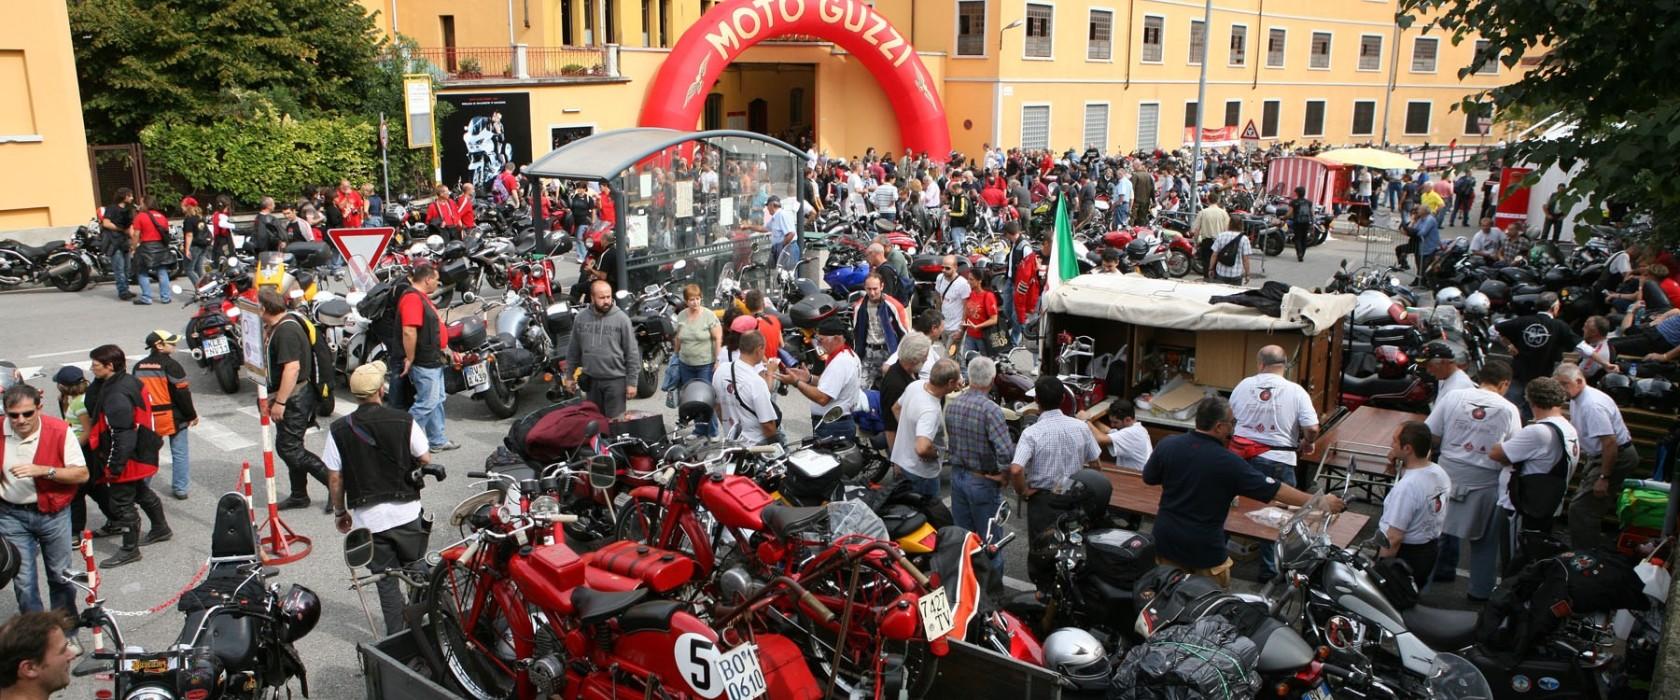 Moto Guzzi Open House 1